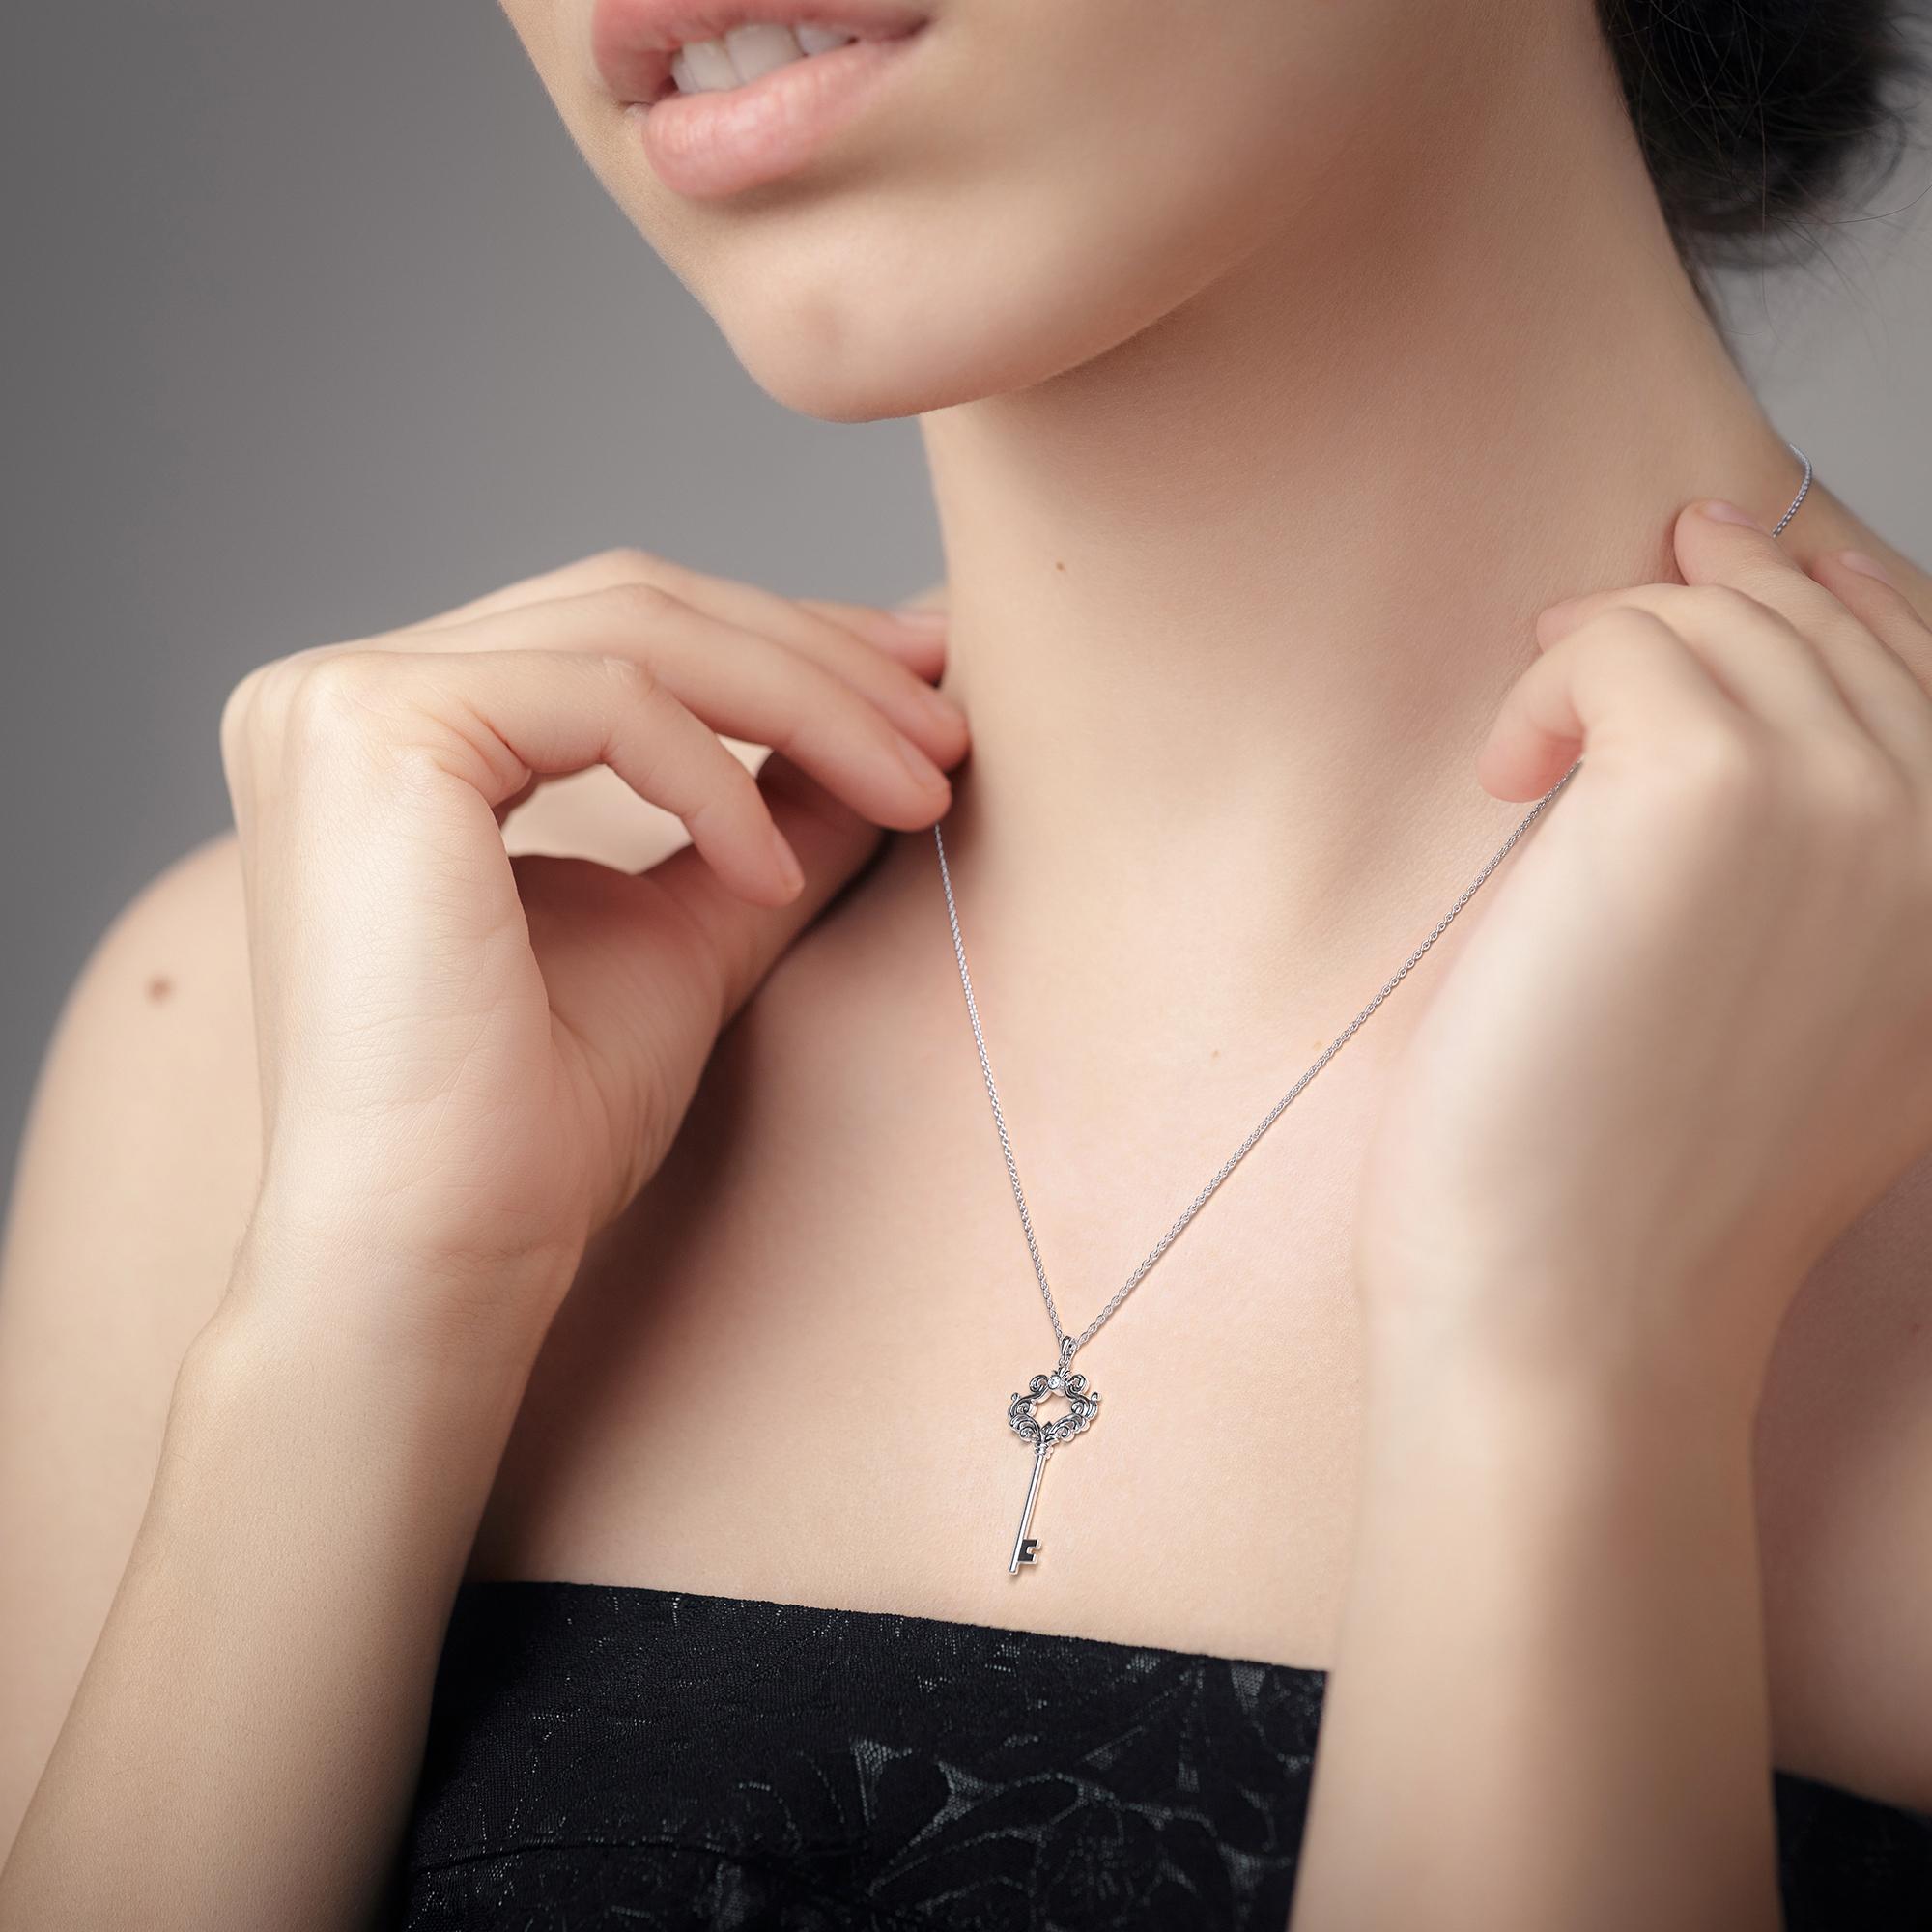 Diamond Key Pendant Diamond Pendant White Gold Necklace Art Deco Style Pendant Fine Jewelry Gift For Her